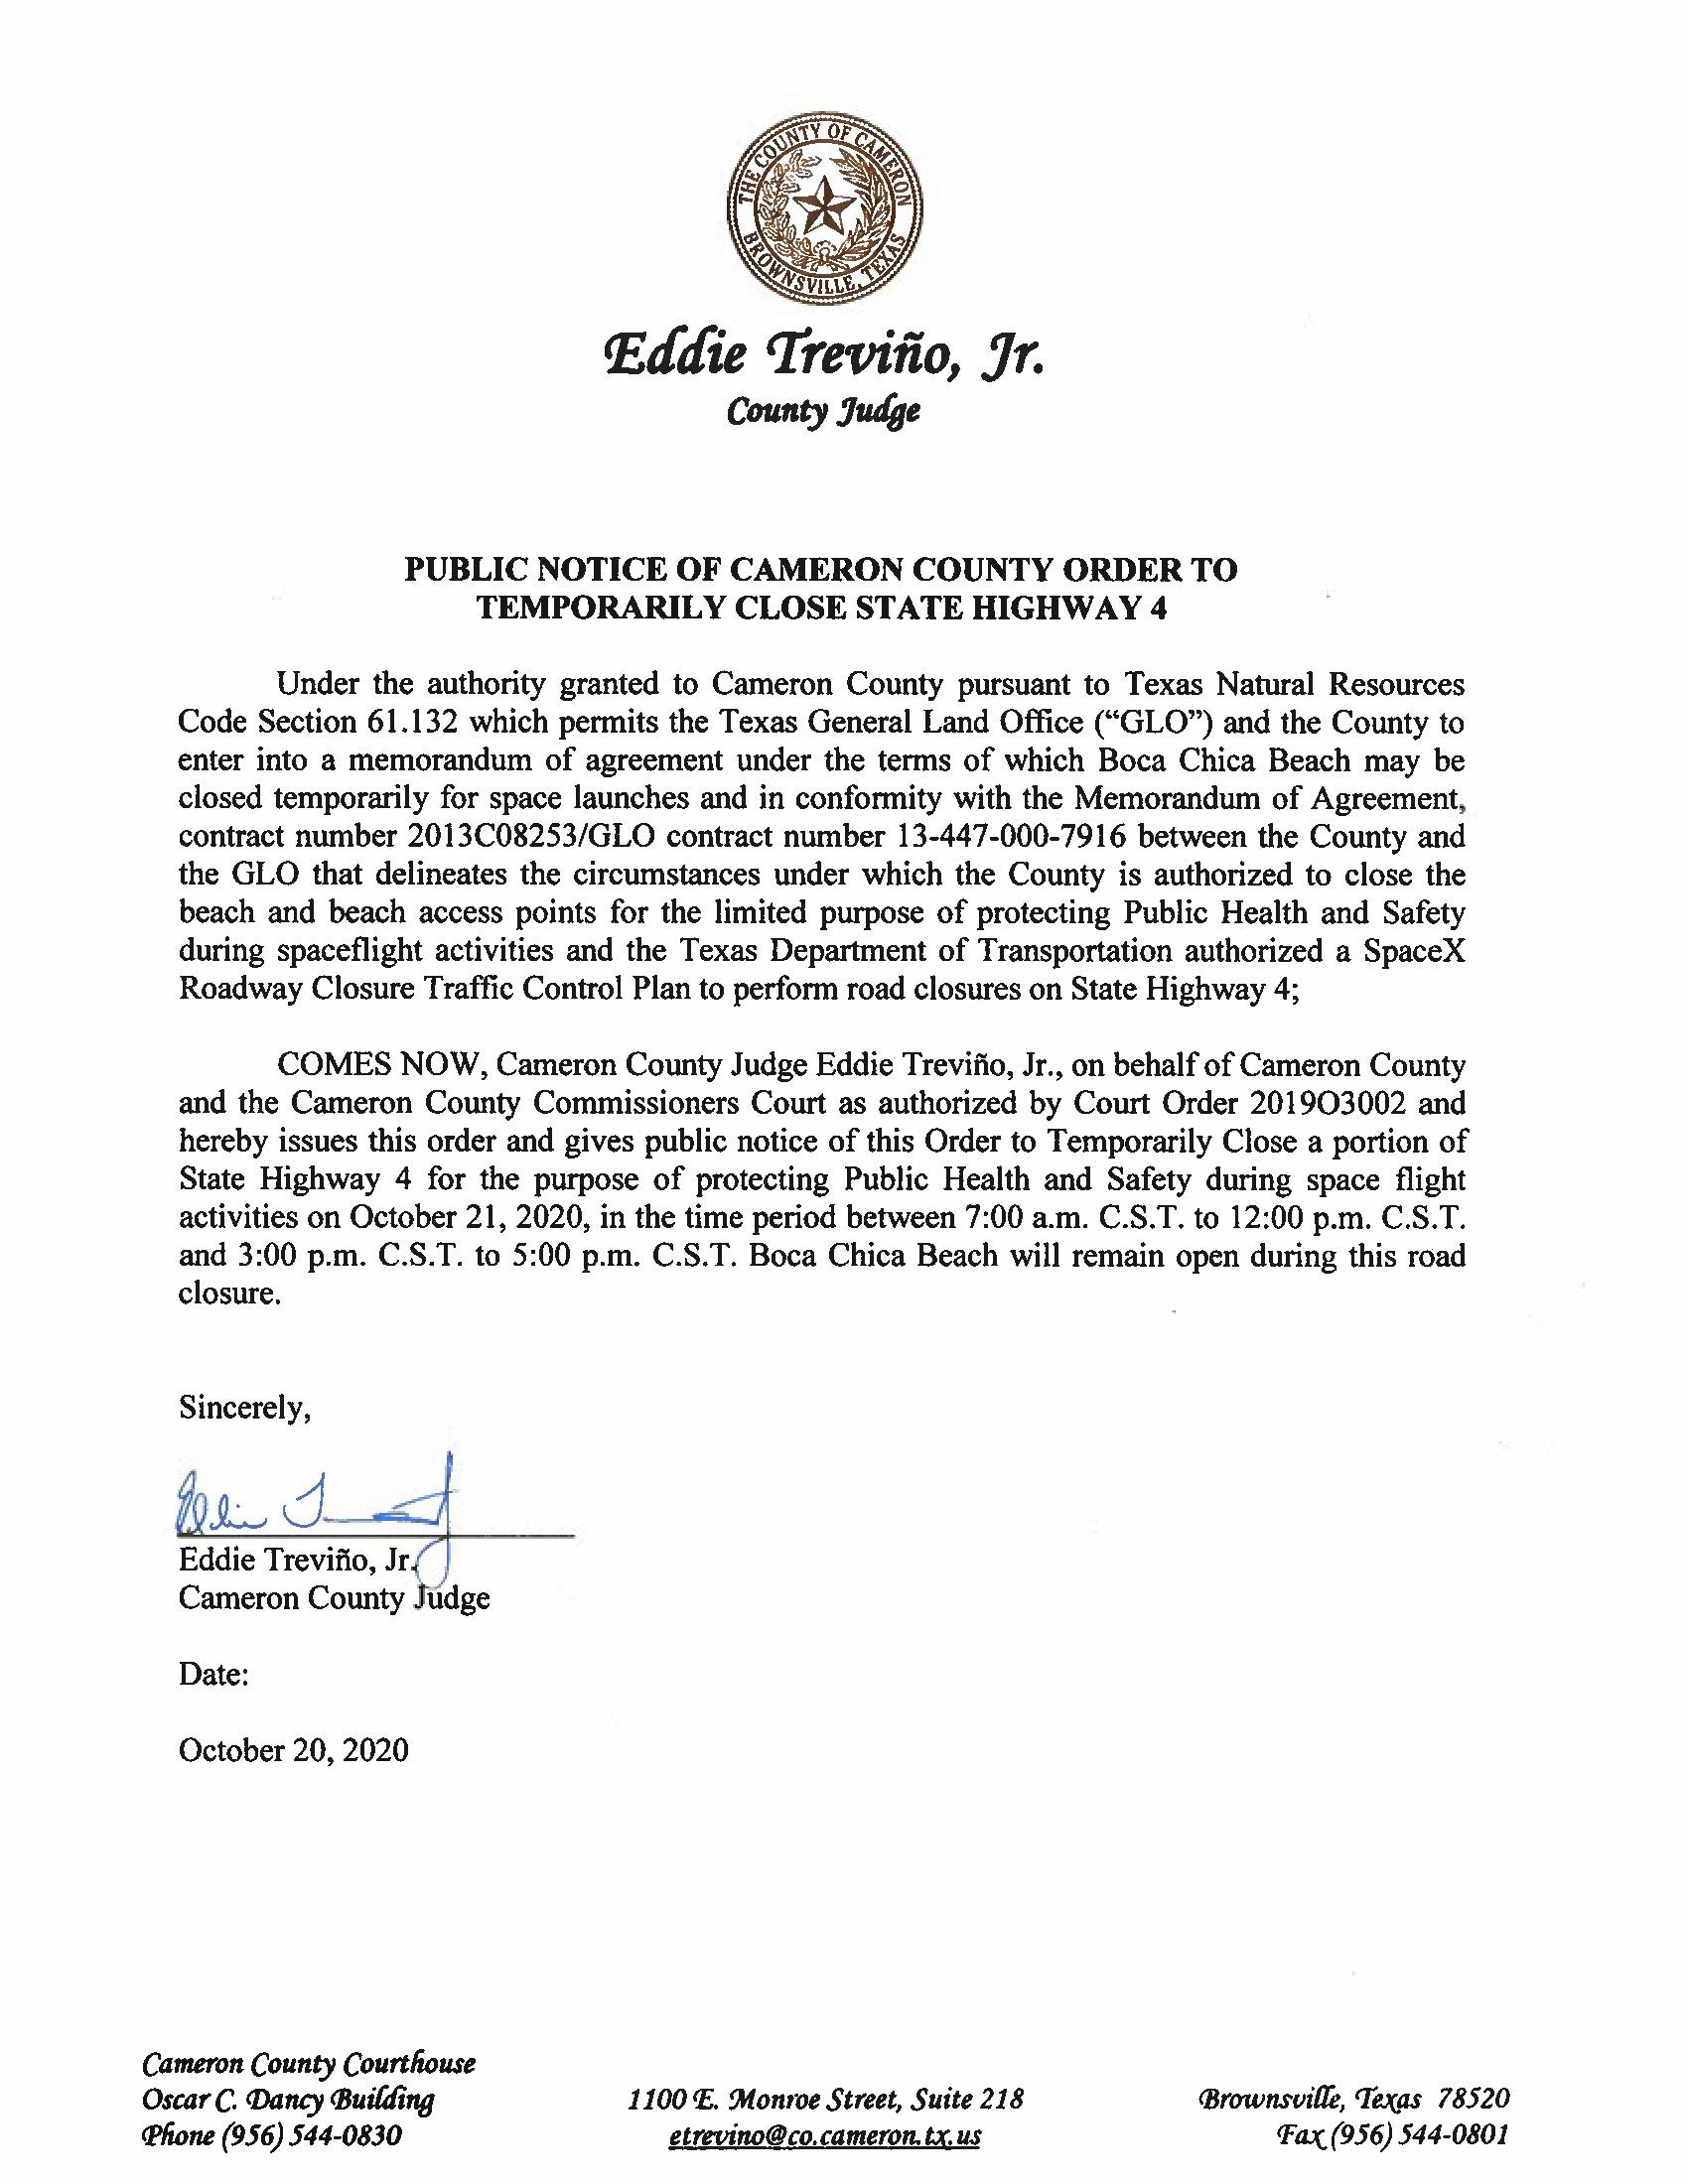 PUBLIC NOTICE OF CAMERON COUNTY ORDER TO TEMP. ROAD CLOSURE. 10.21.20